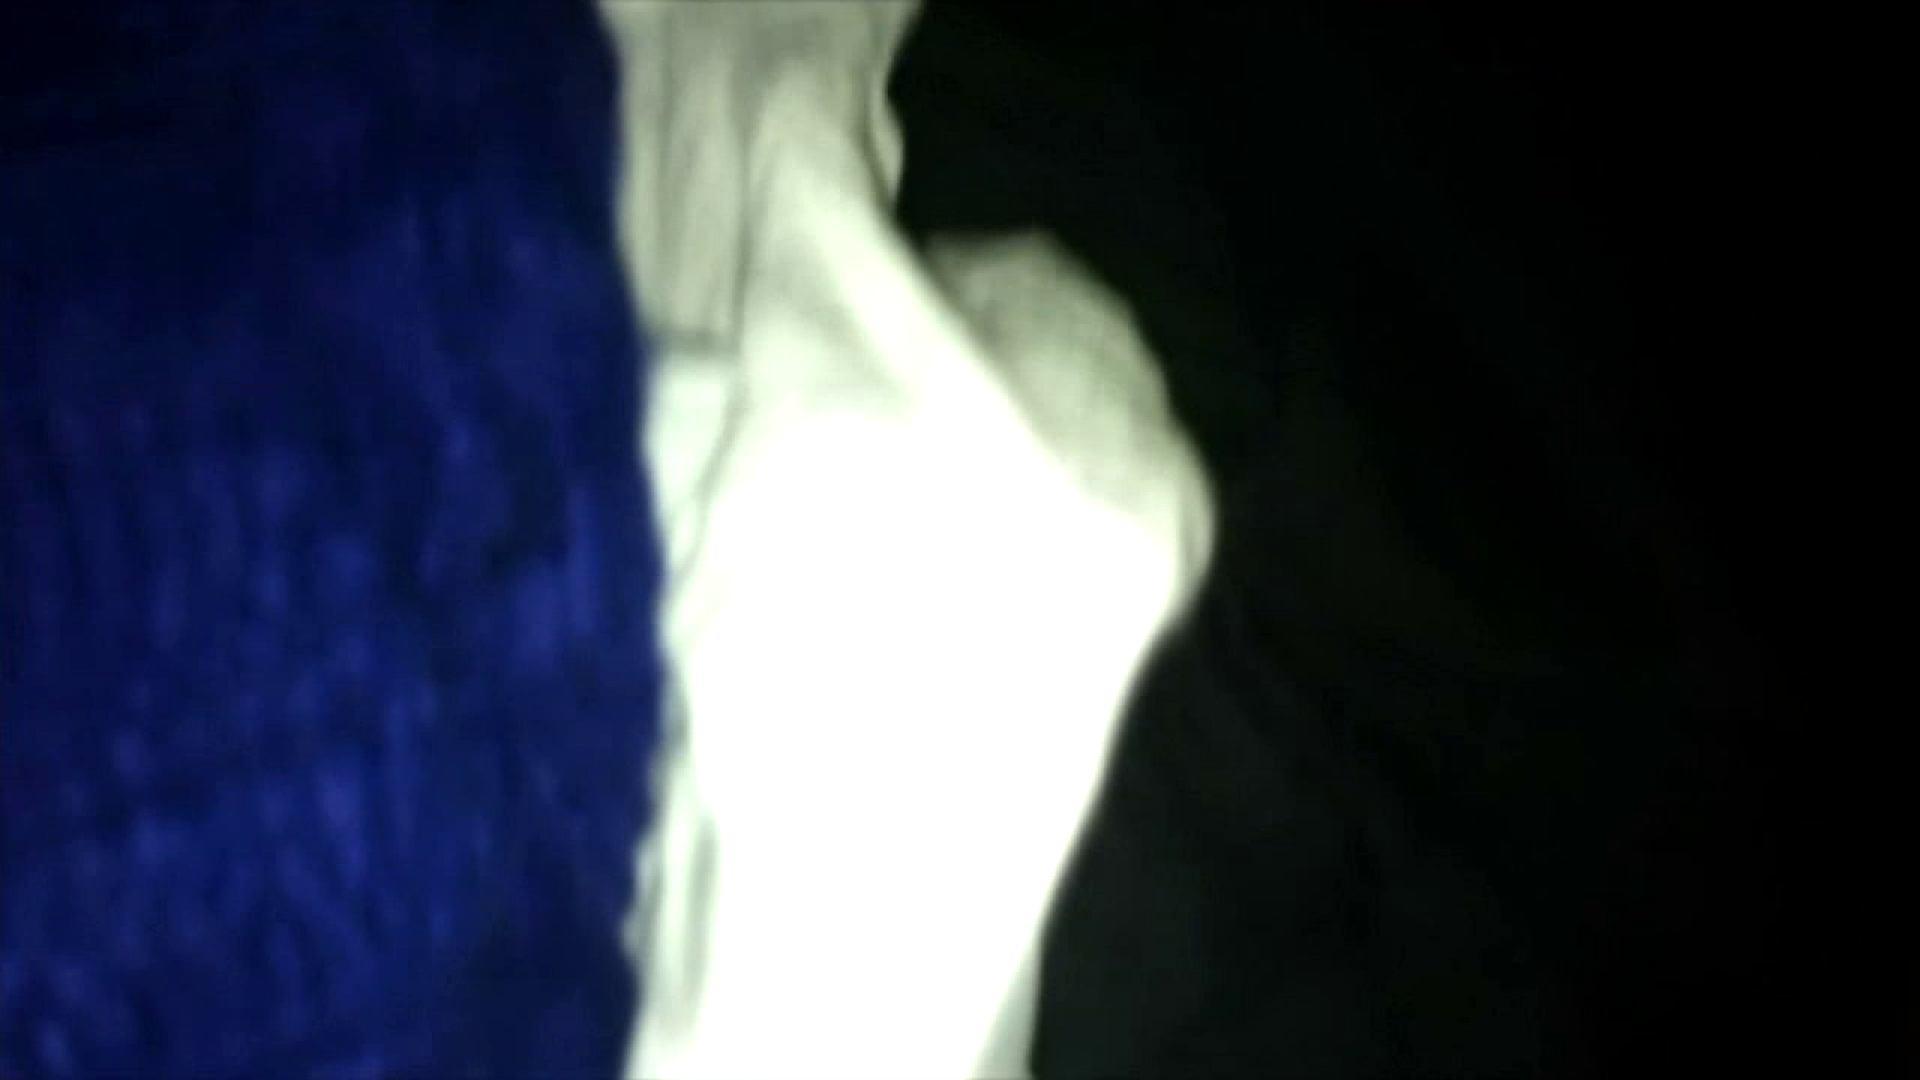 vol.22 【YHちゃん】パルコ店員20歳 mixiオフ会で いやらしい女子大生 盗み撮り動画 64連発 11